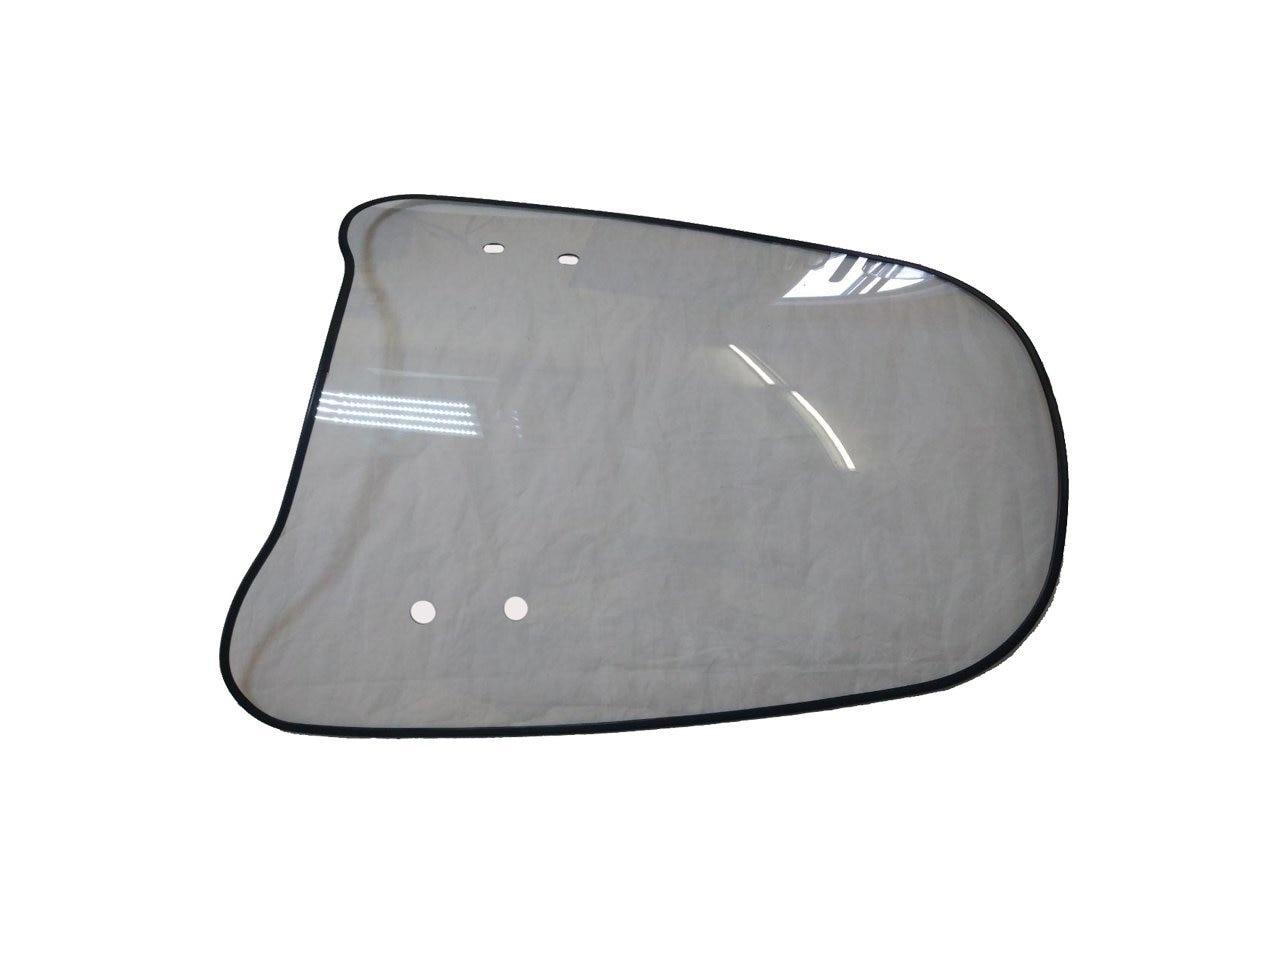 Glass windscreen 21900 1100011 00 Bor for Lada (VAZ) Granta, I, 1.6 Mt (87 hp) (01.2011 2018)